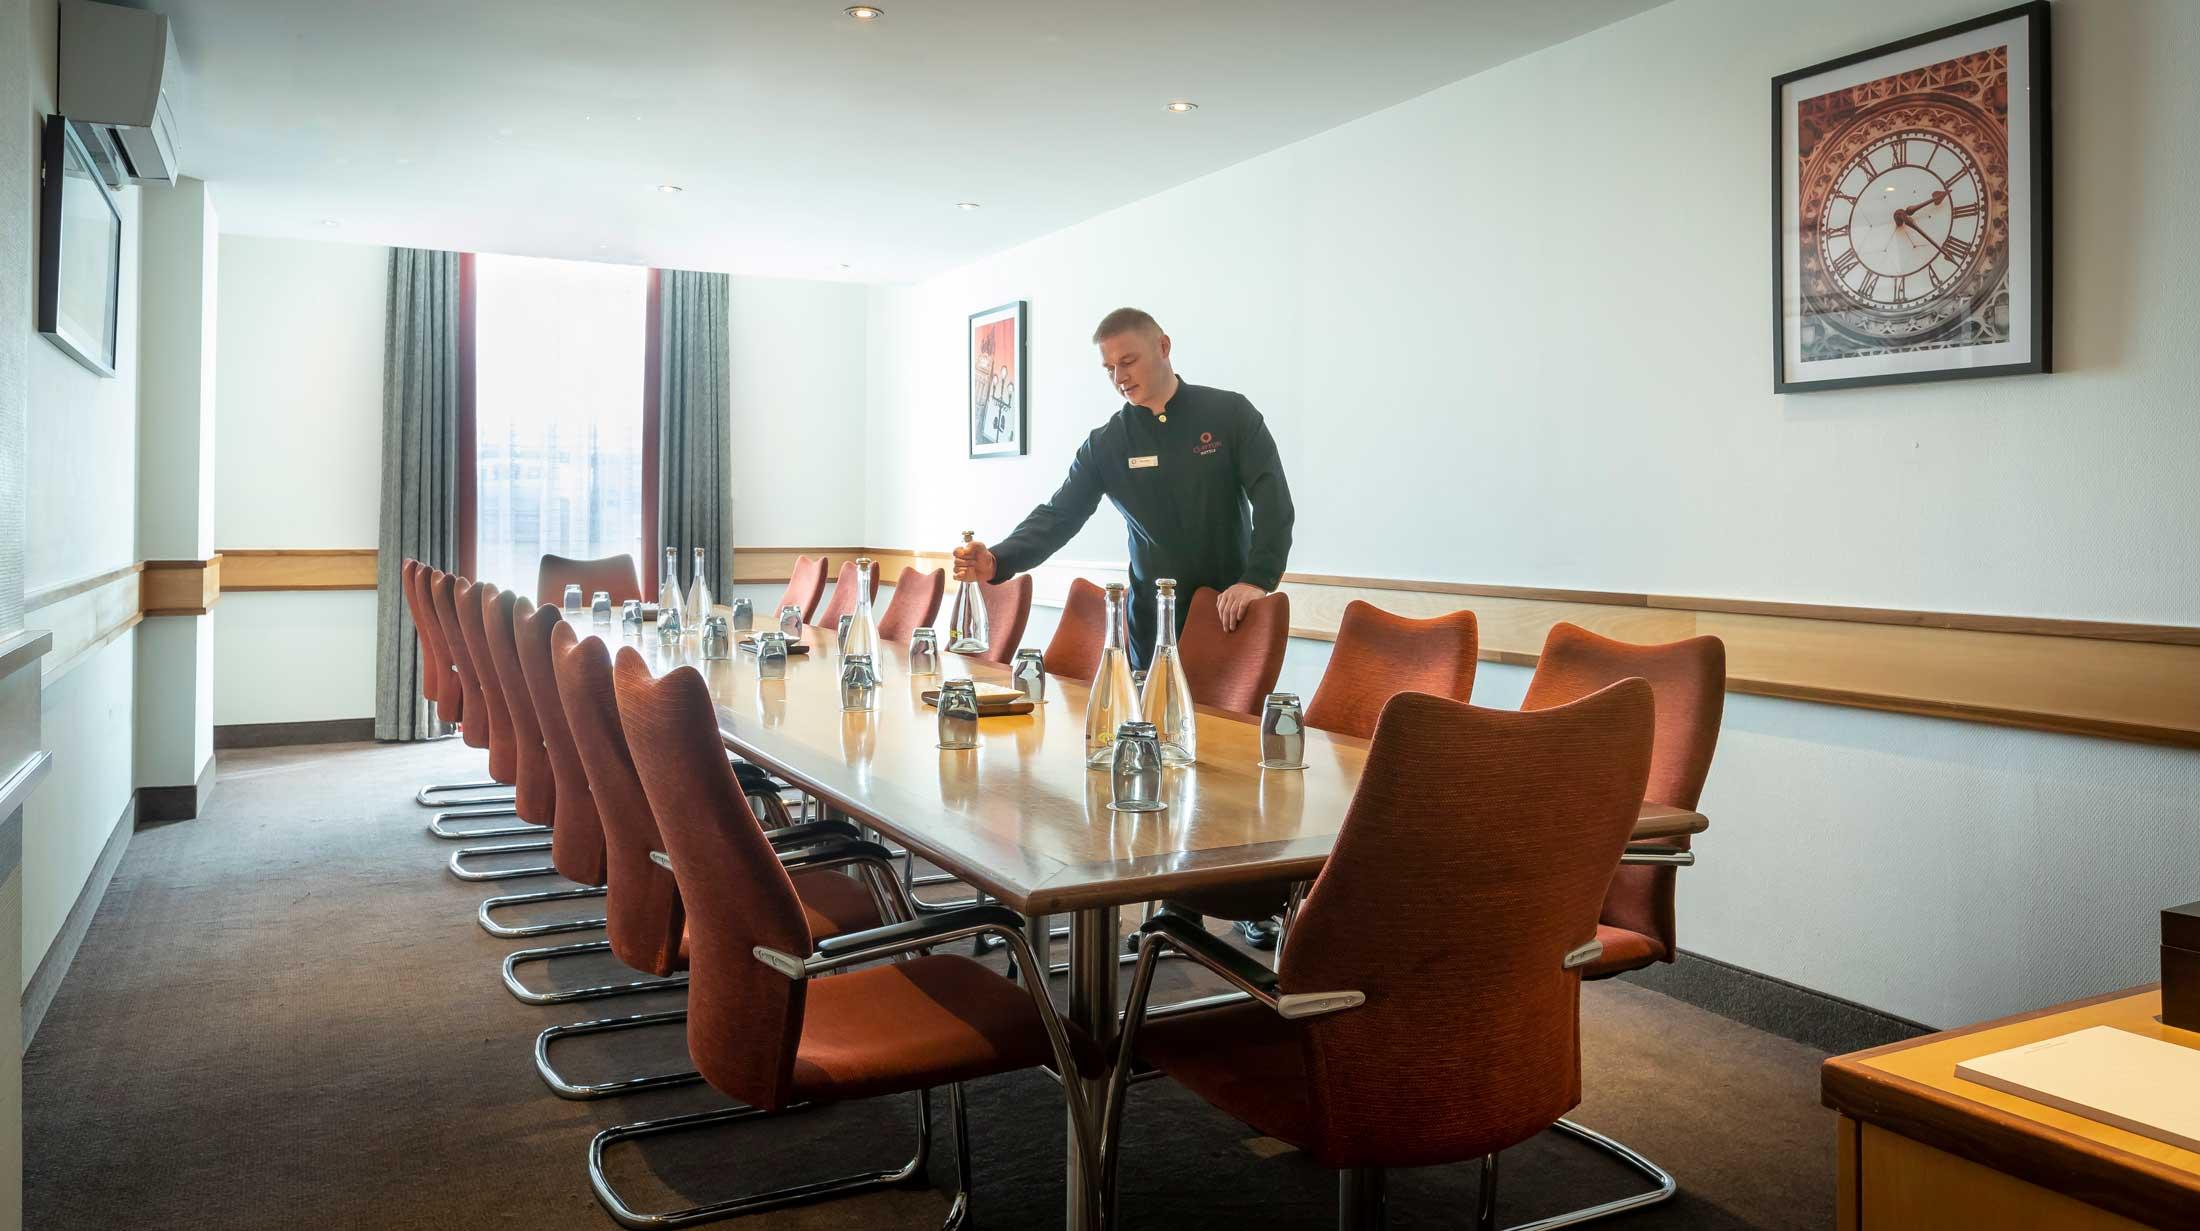 Staff preparing a boardoom meeting at Clayton Hotel Manchester Airport